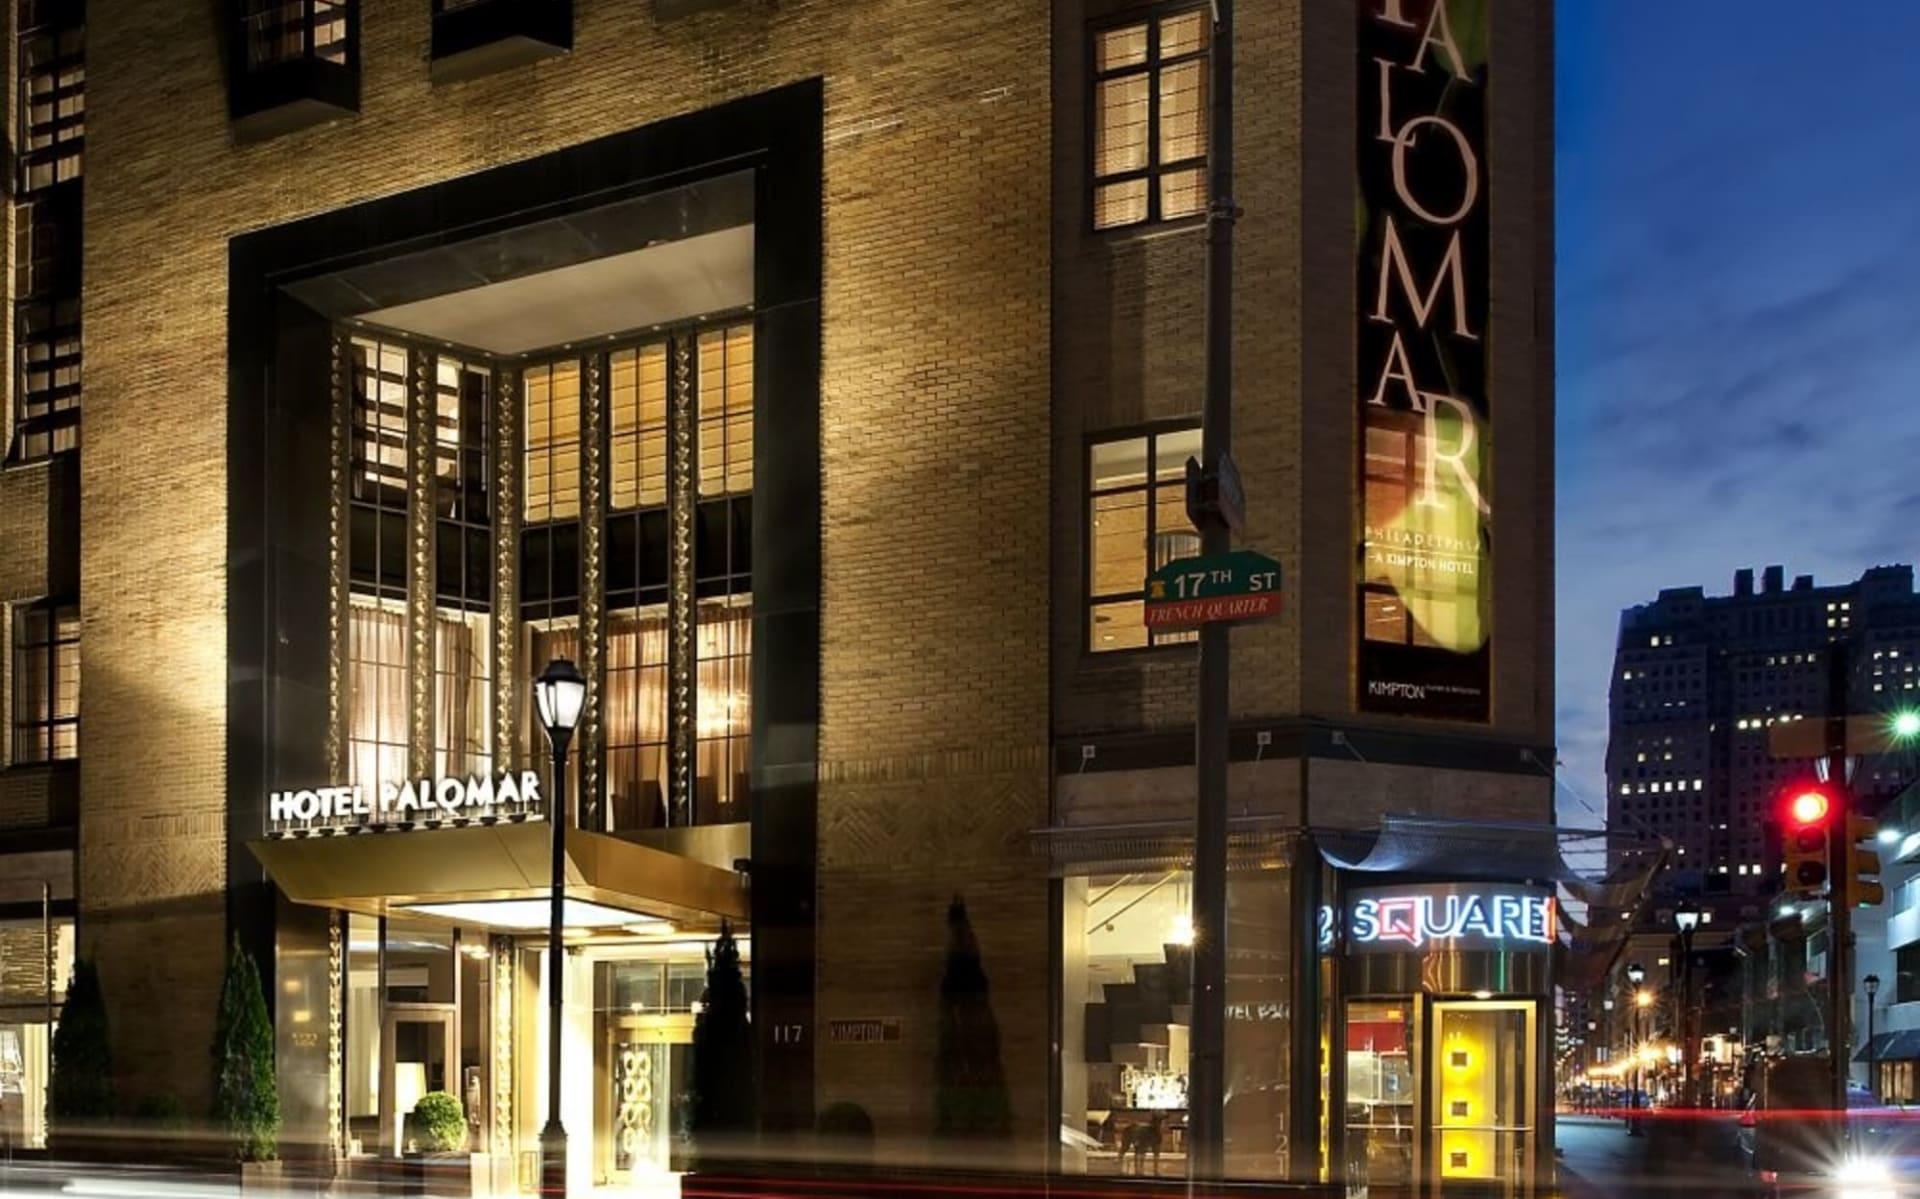 Hotel Palomar Philadelphia: Exterior_Hotel Palomar PHL_Aussenansicht bei Nacht_Bonotel